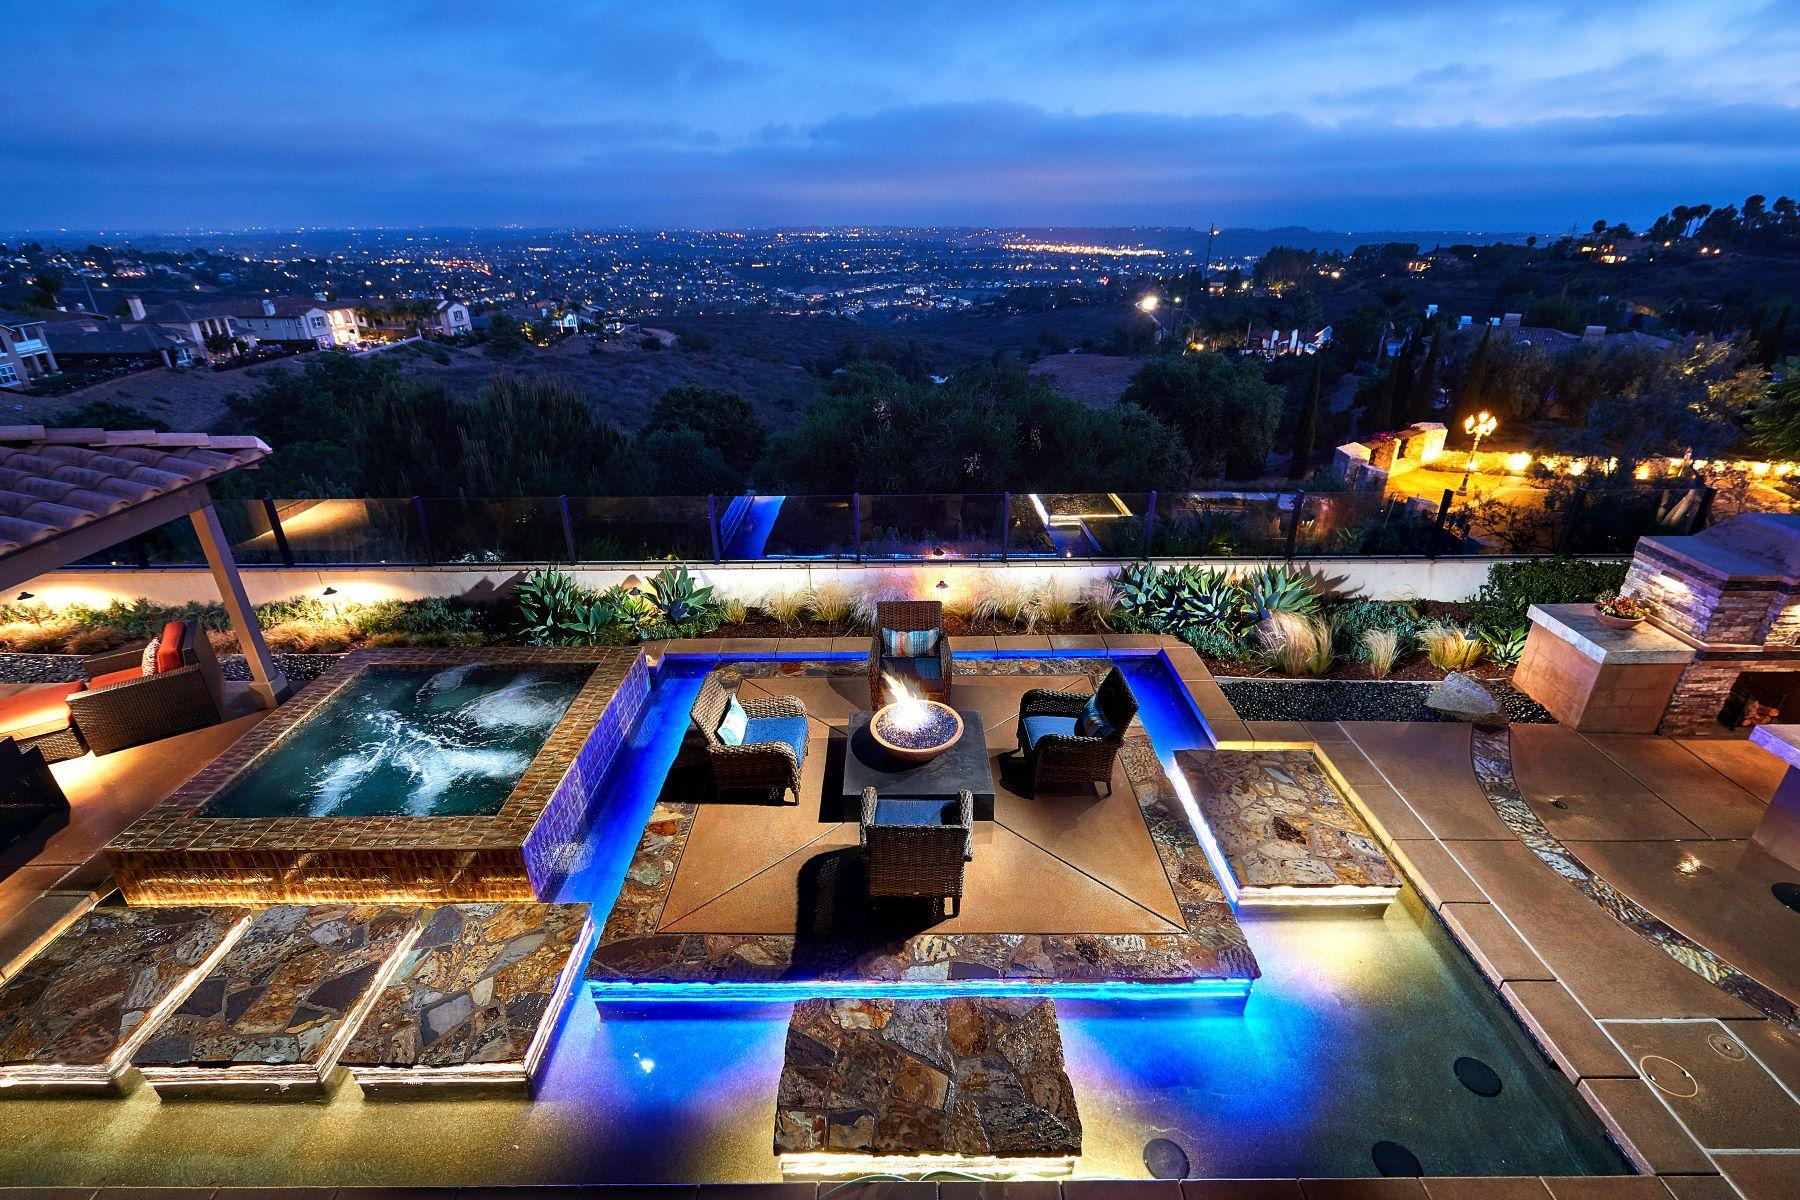 Single Family Home for Active at 6925 Corte Langosta 6925 Corte Langosta Carlsbad, California 92009 United States